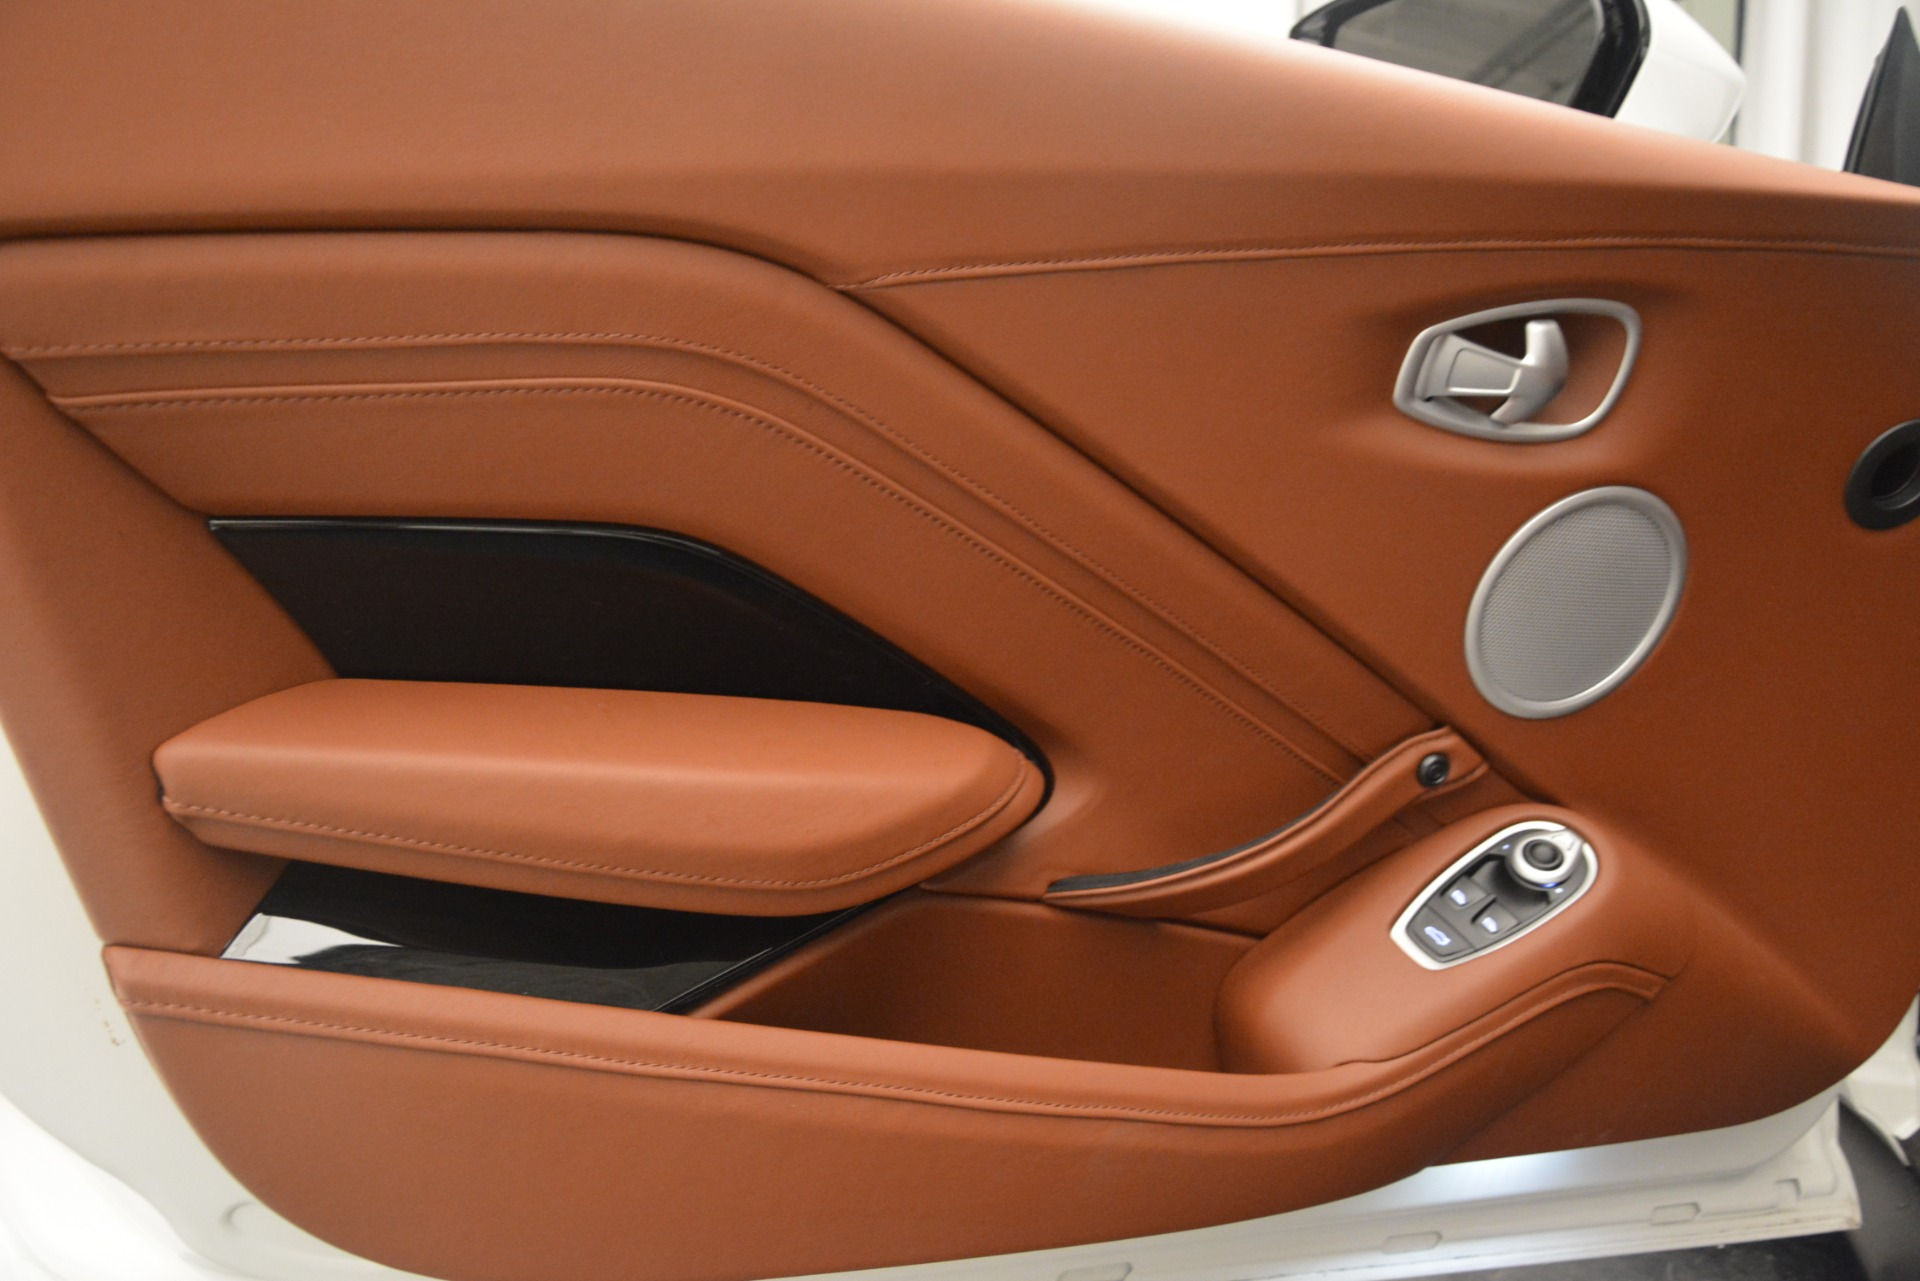 New 2019 Aston Martin Vantage Coupe For Sale In Greenwich, CT. Alfa Romeo of Greenwich, A1373 3227_p16